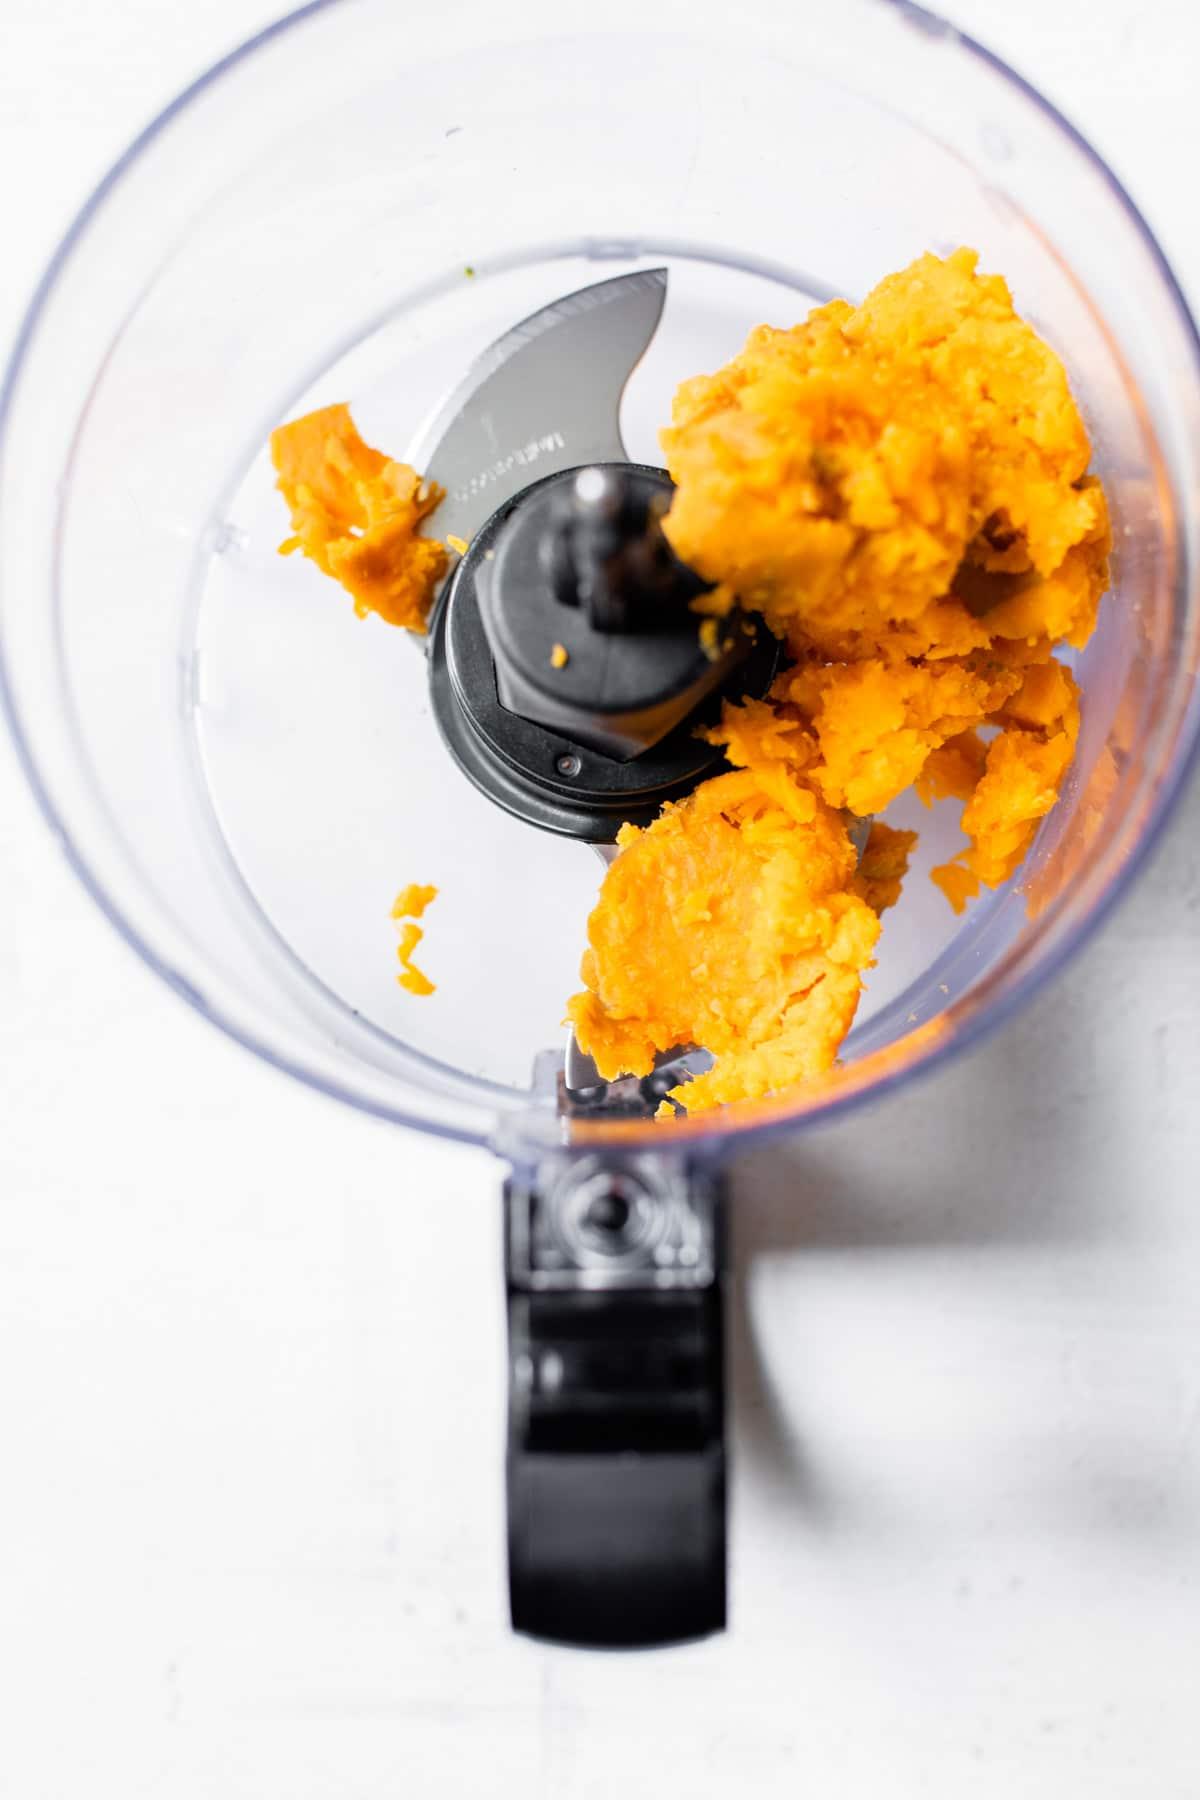 sweet potato in a food processor